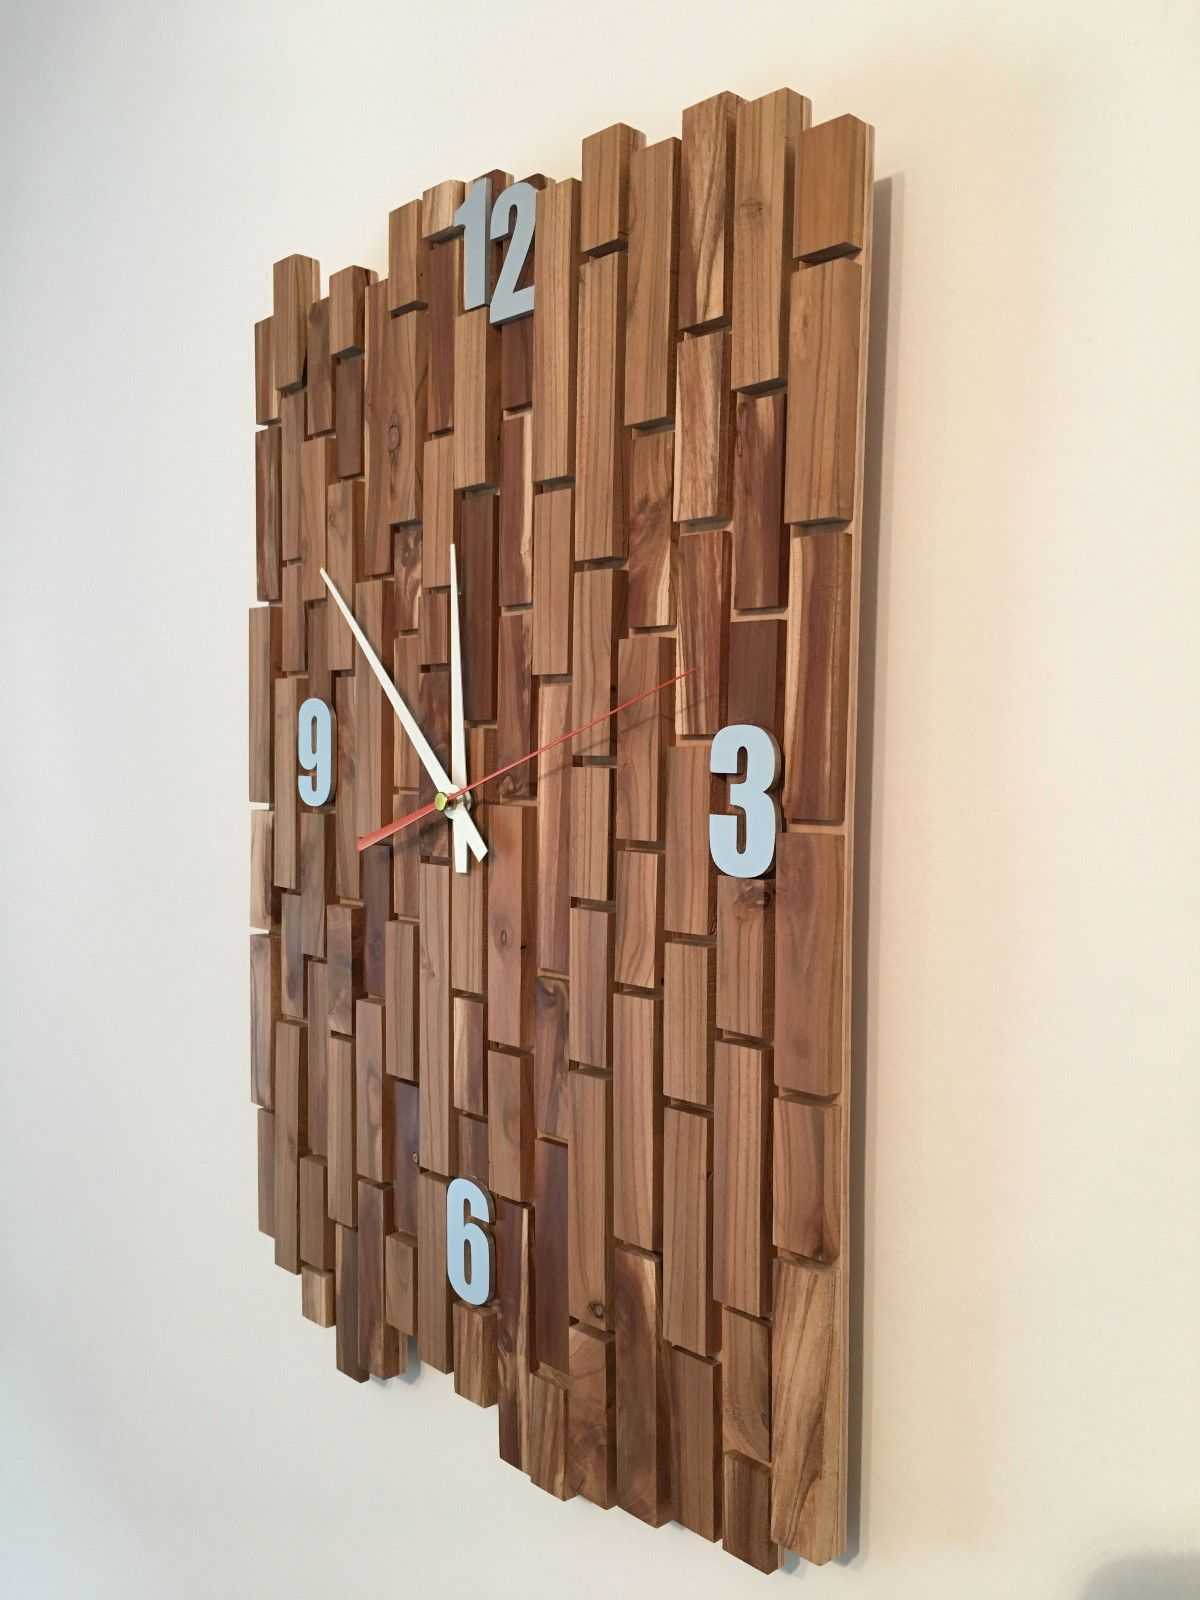 Pin by Бедуля юрий on Часы pinterest clocks wood clocks and